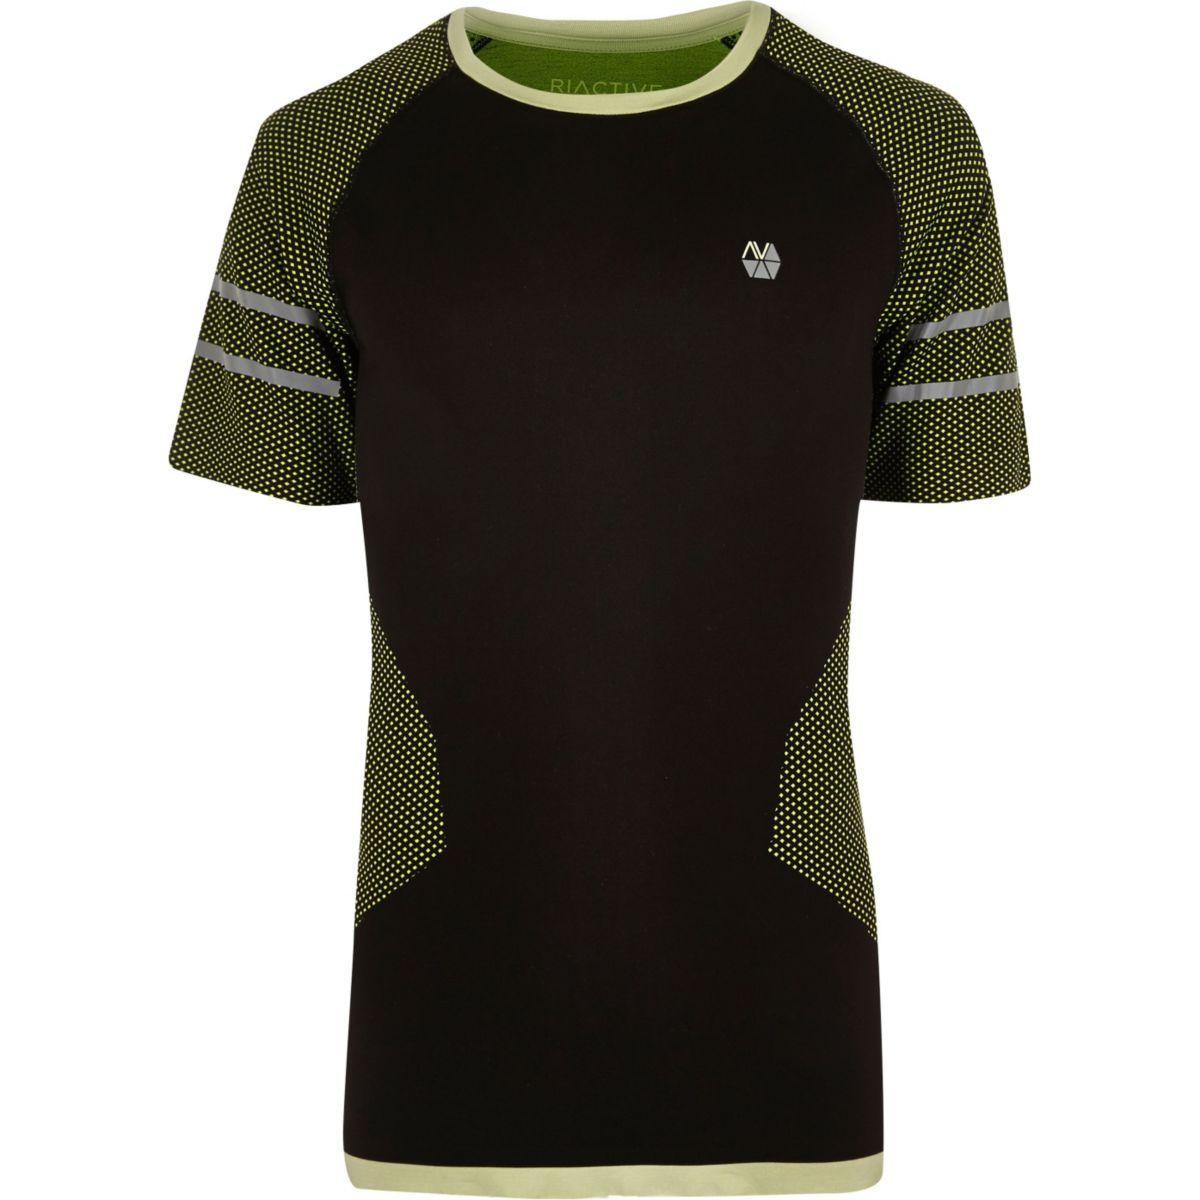 RI Active fluro black seamless sports T-shirt